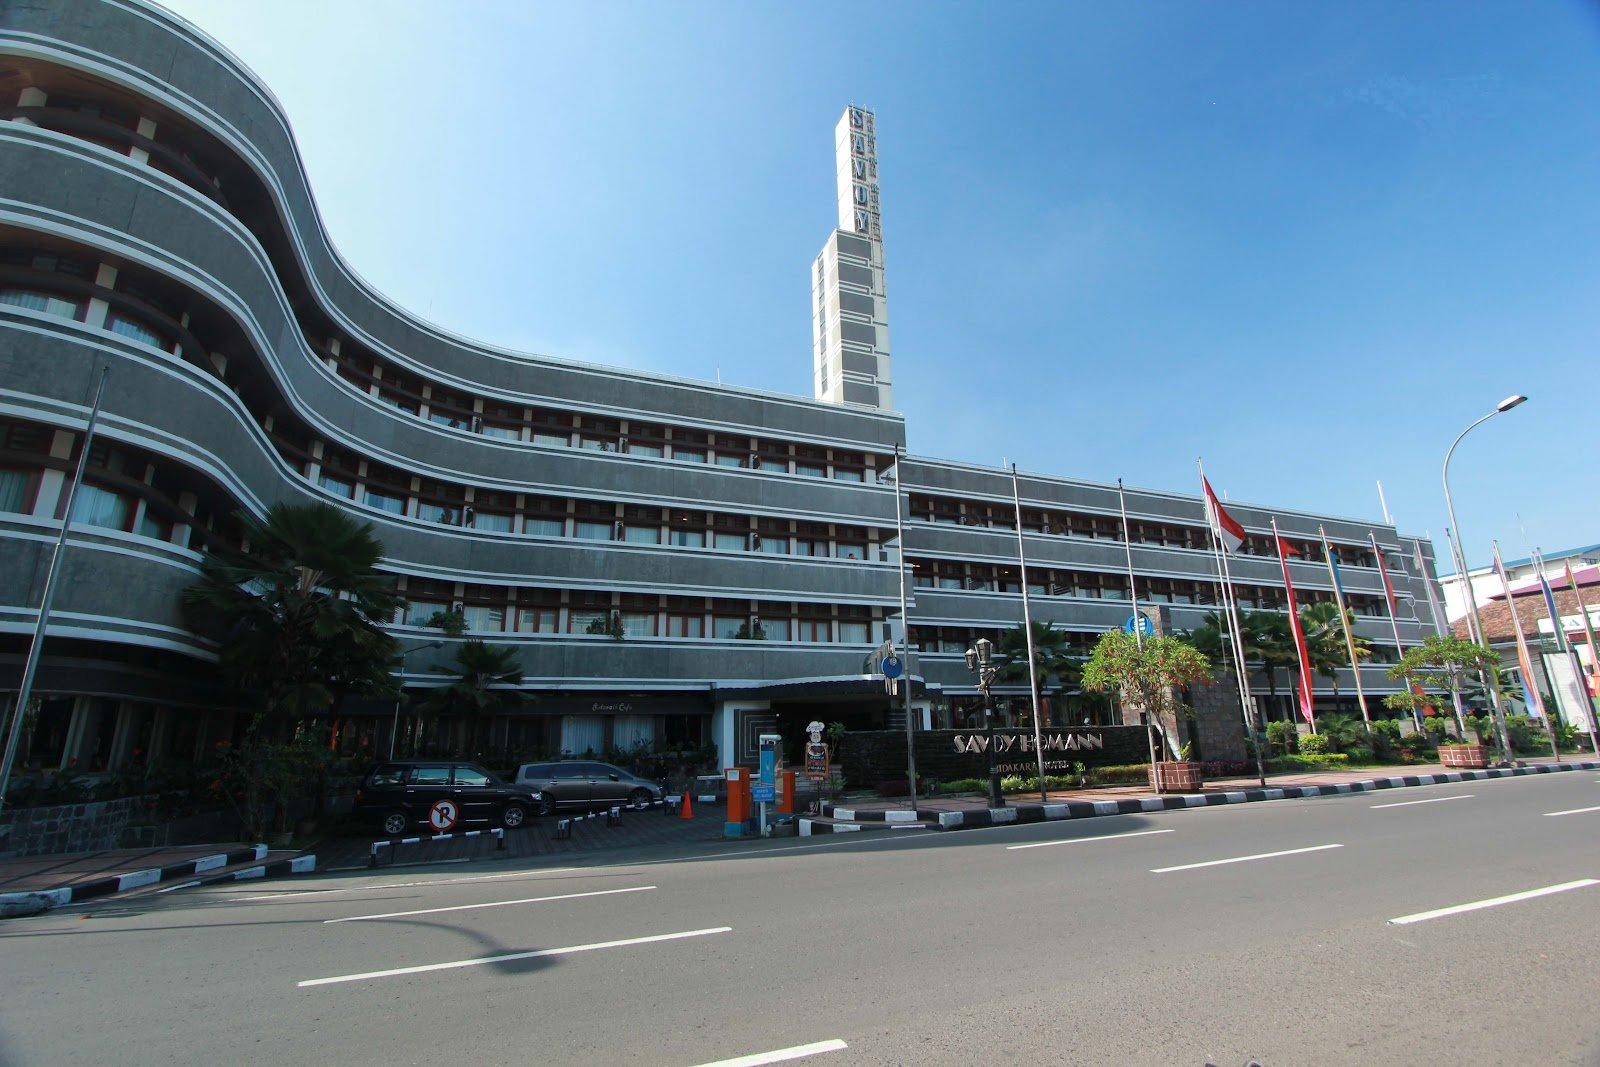 Savoy Homann - Bandung